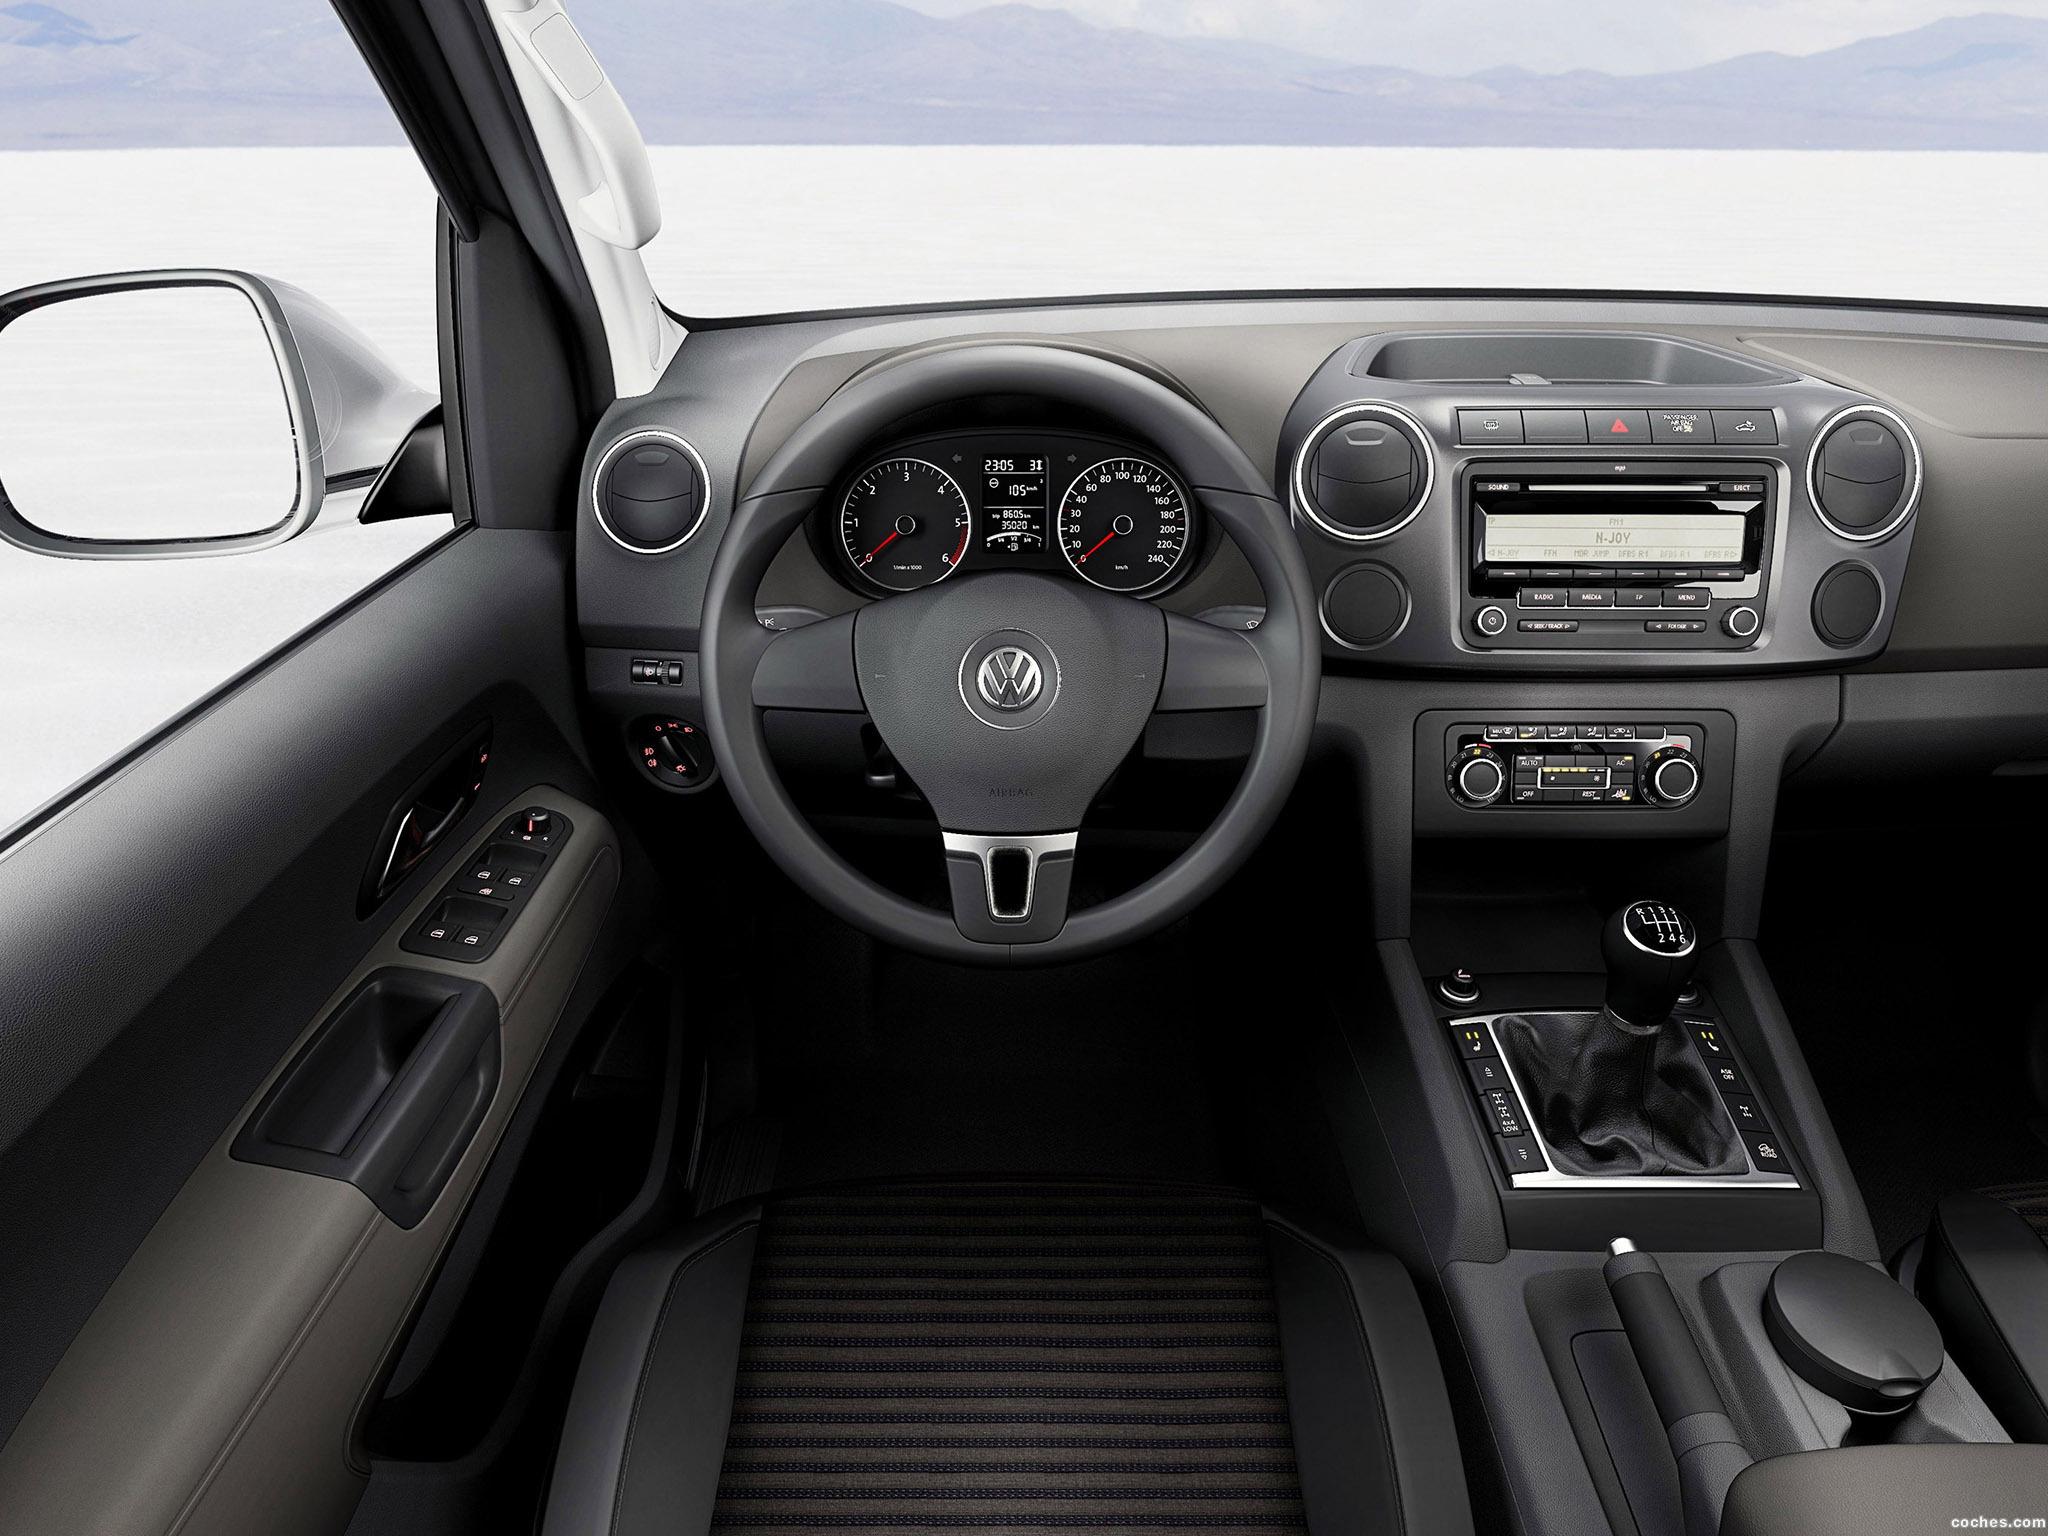 Foto 22 de Volkswagen Amarok Doble Cabina 2010